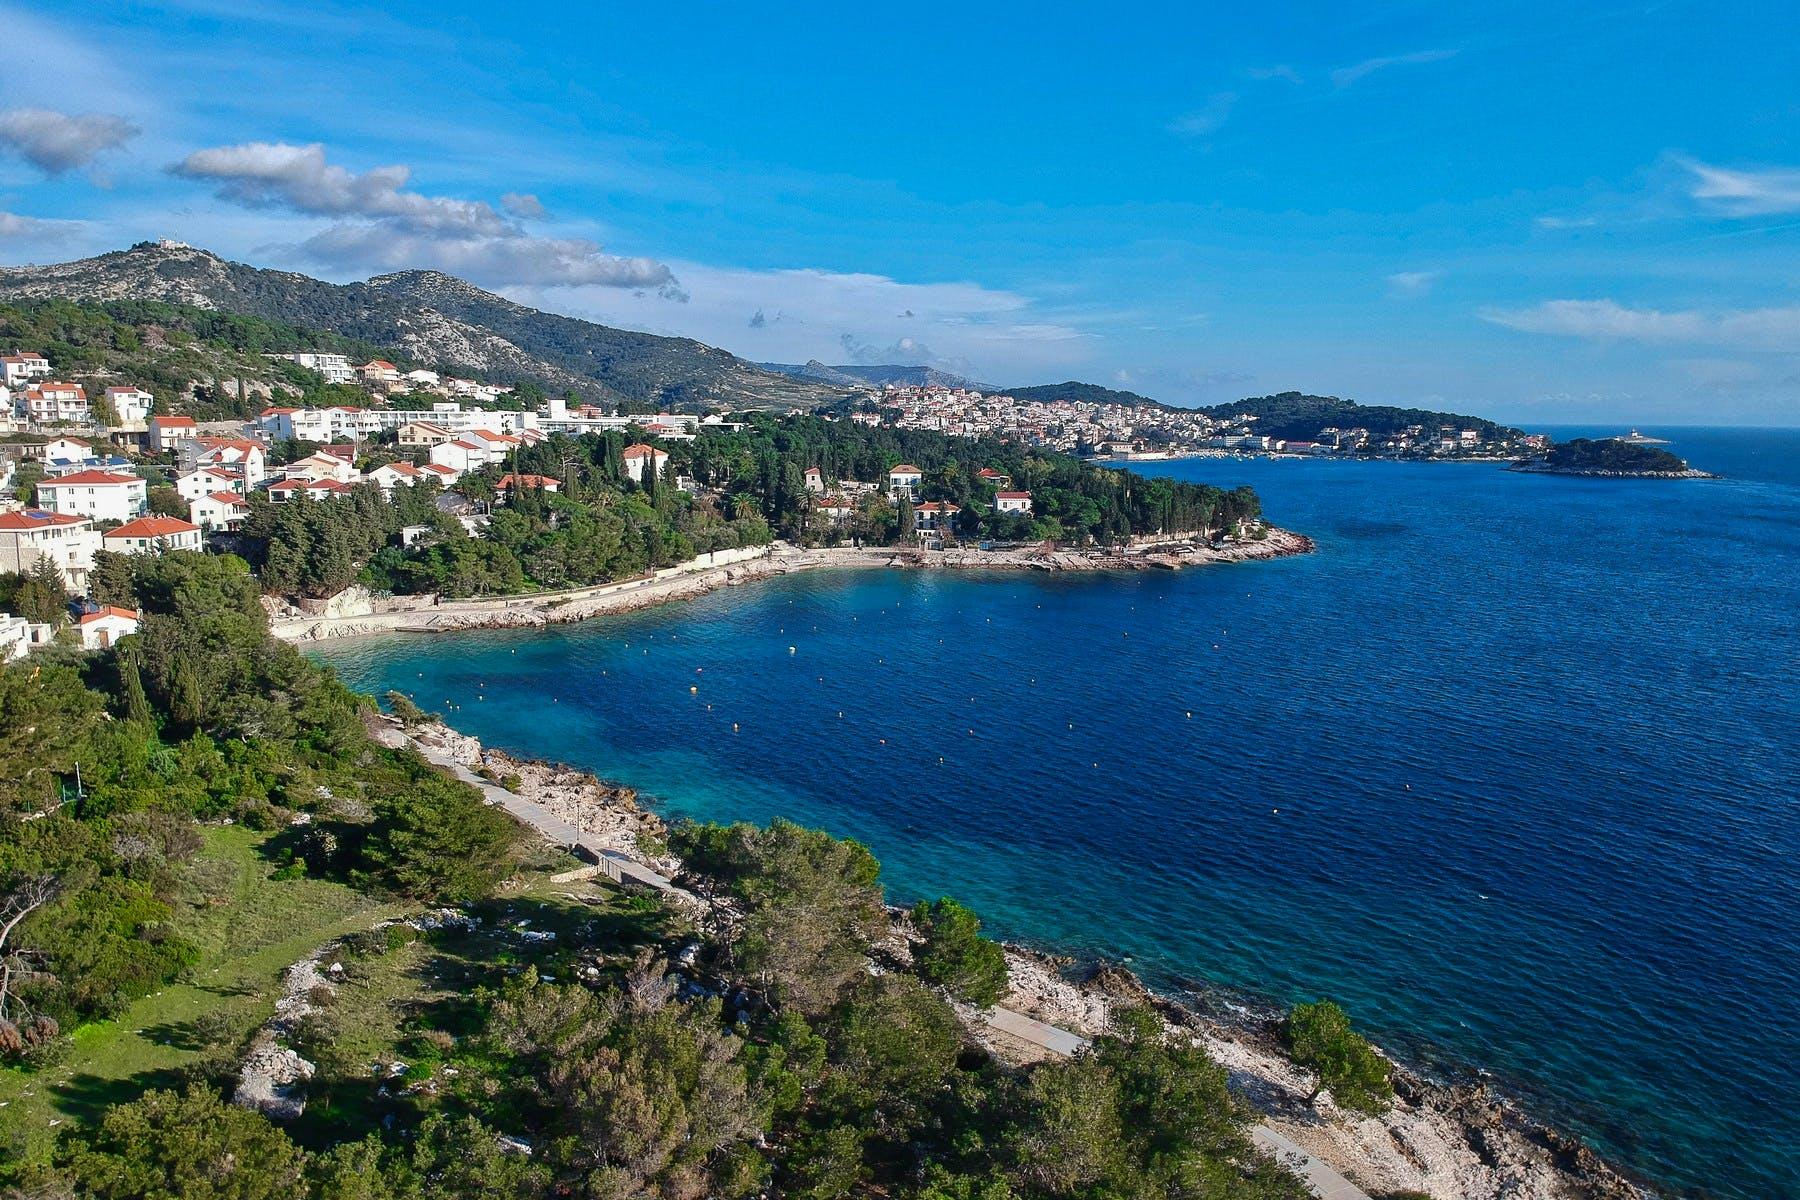 Impressive blue Adriatic of Hvar city